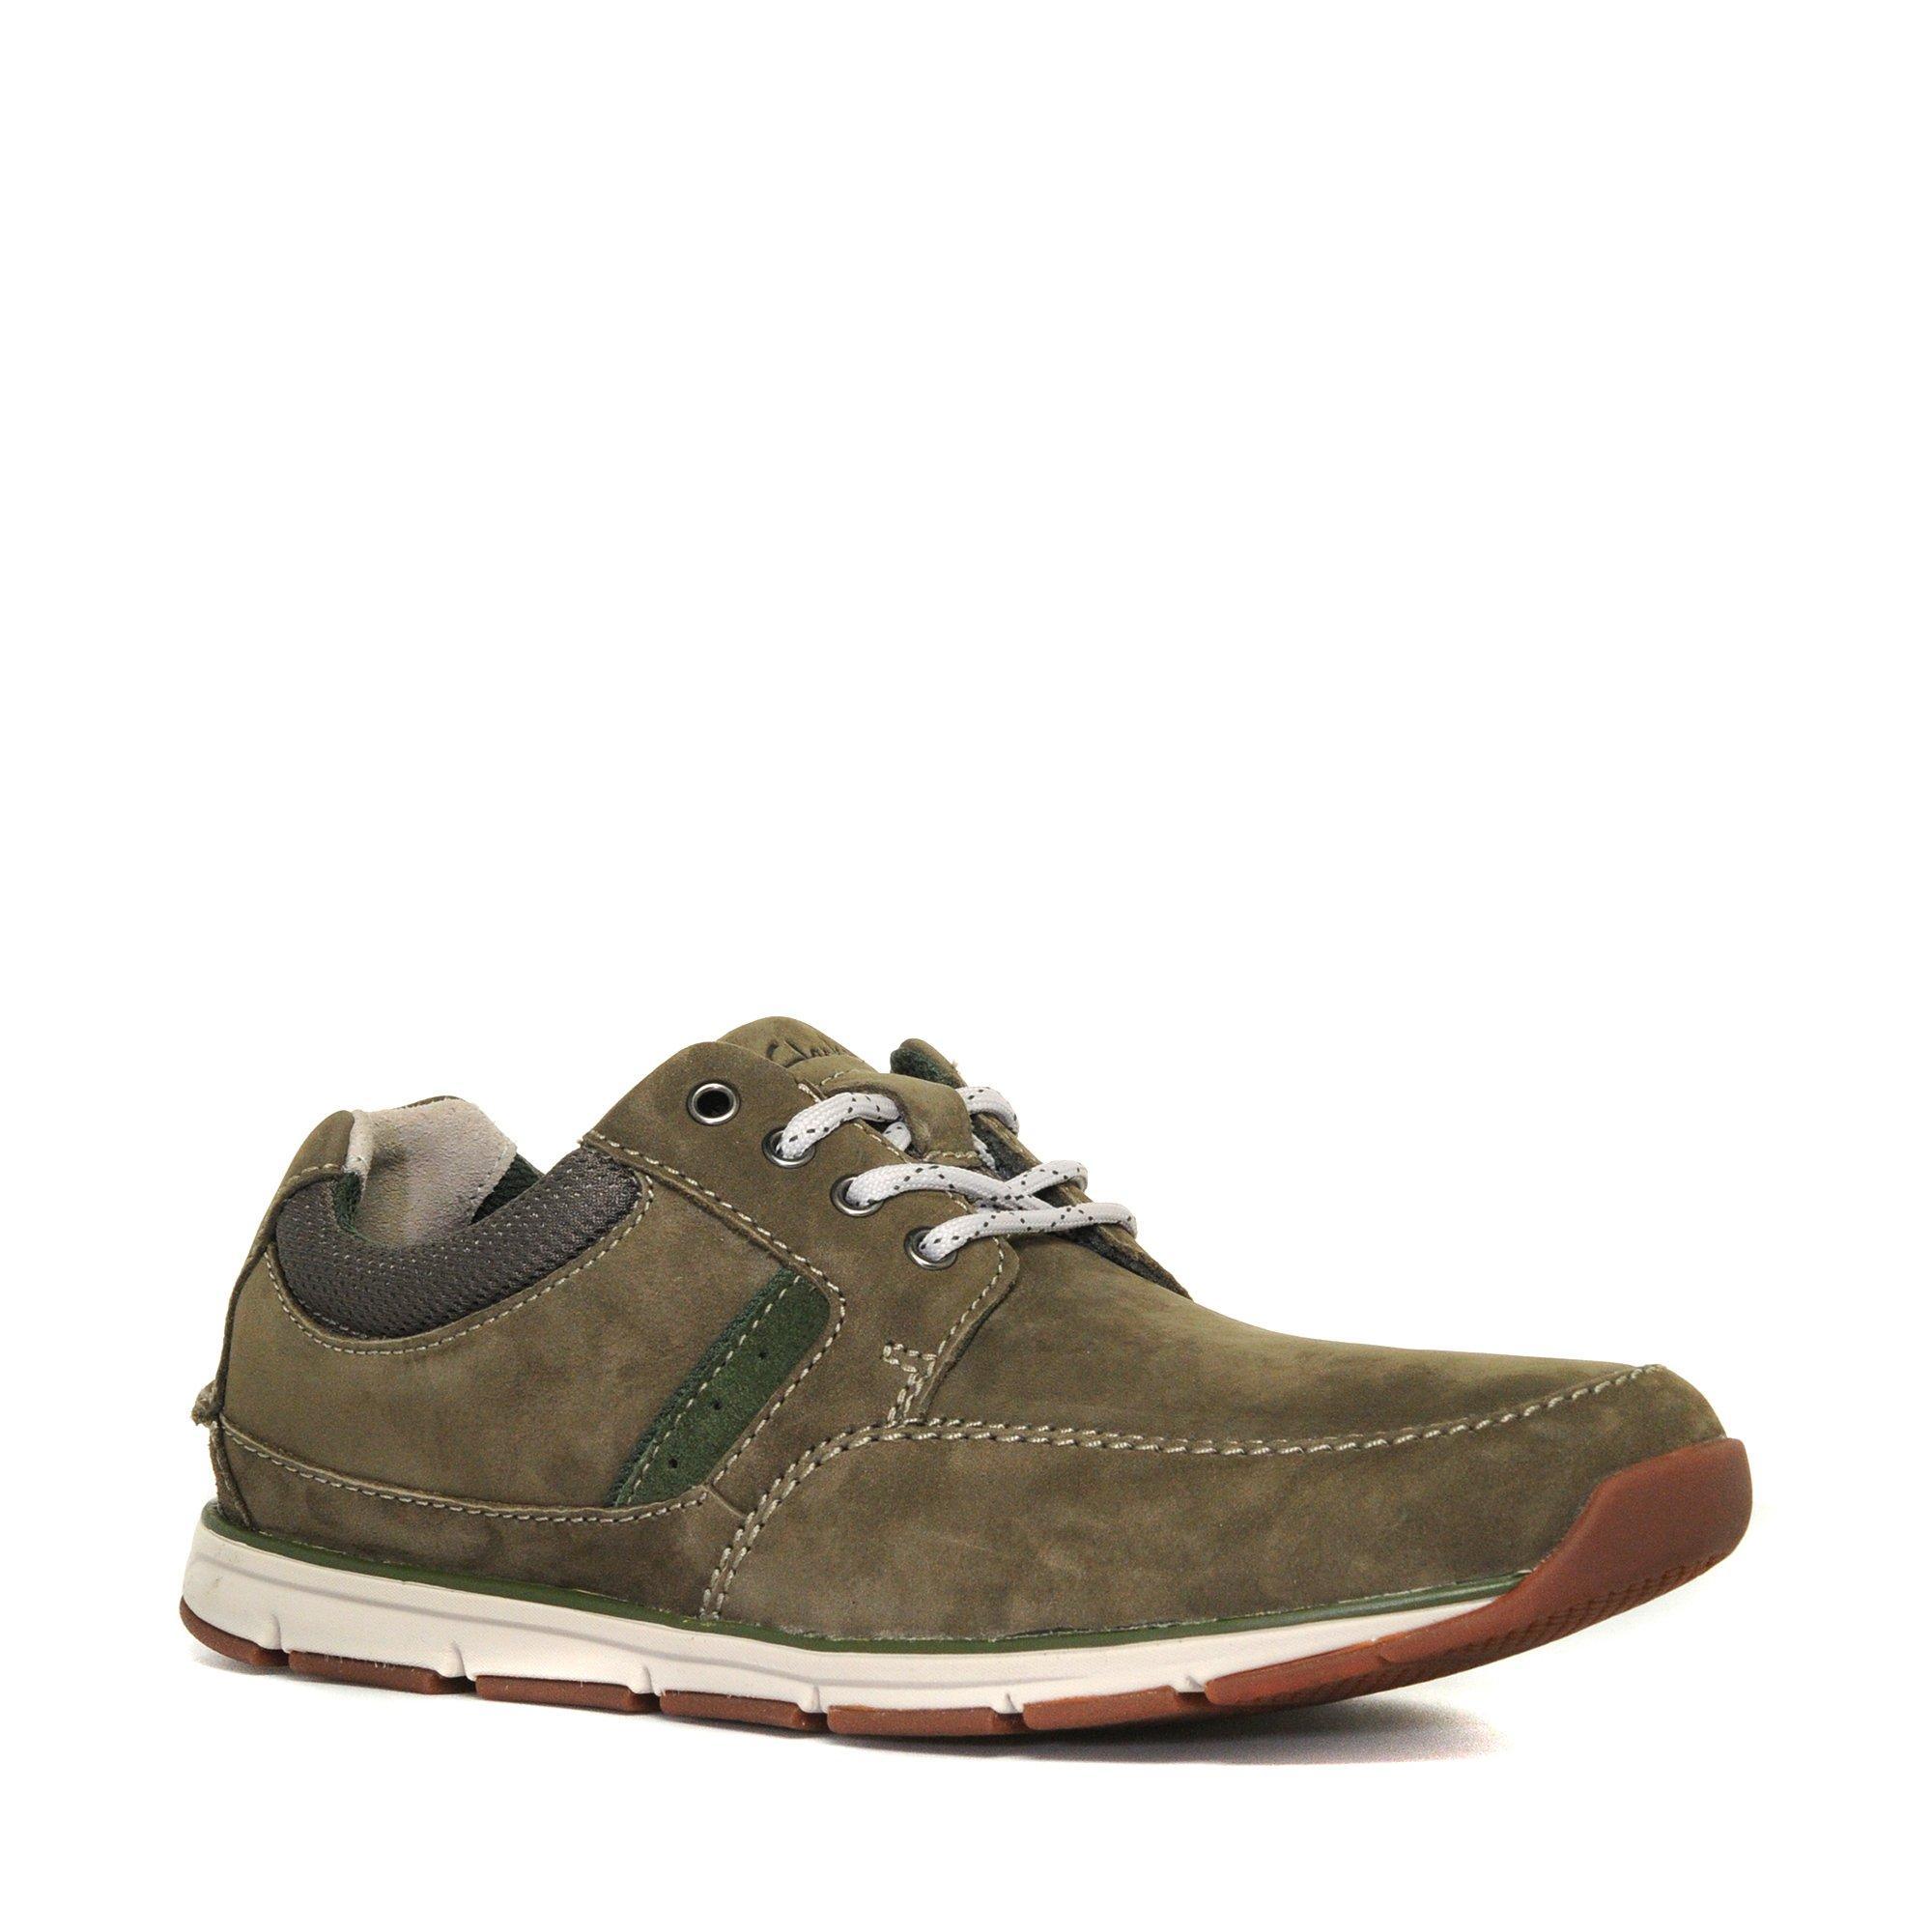 Clarks Mens Beachmont Edge Casual Shoes Khaki